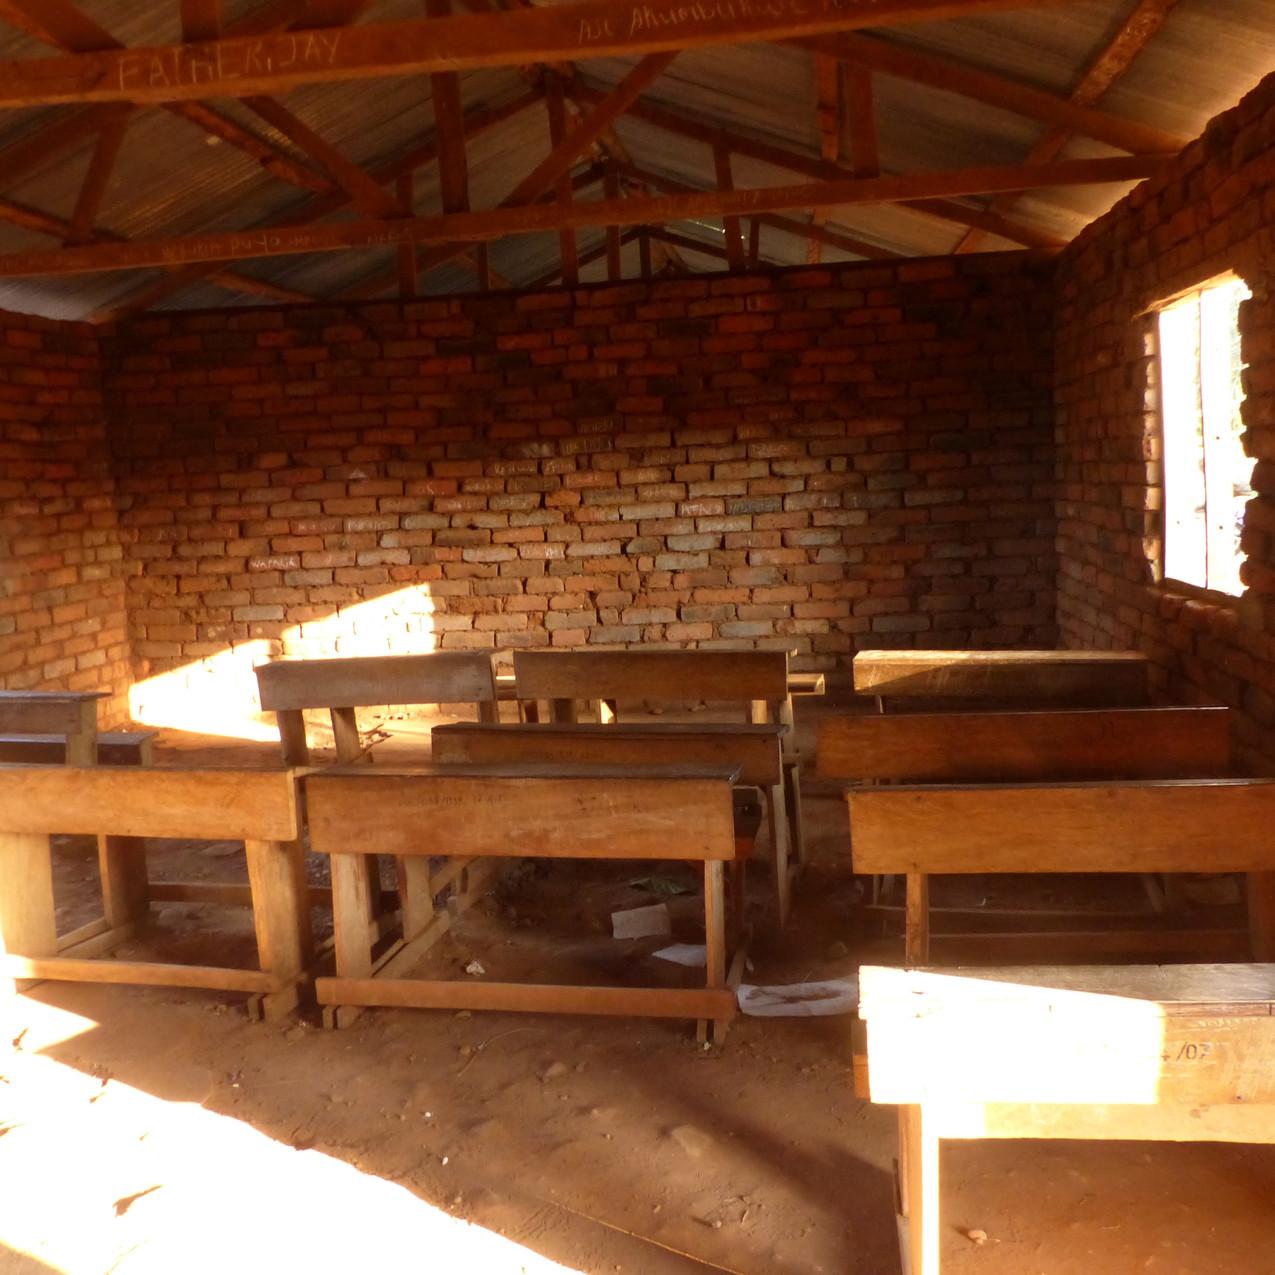 初回訪問時の教室内部